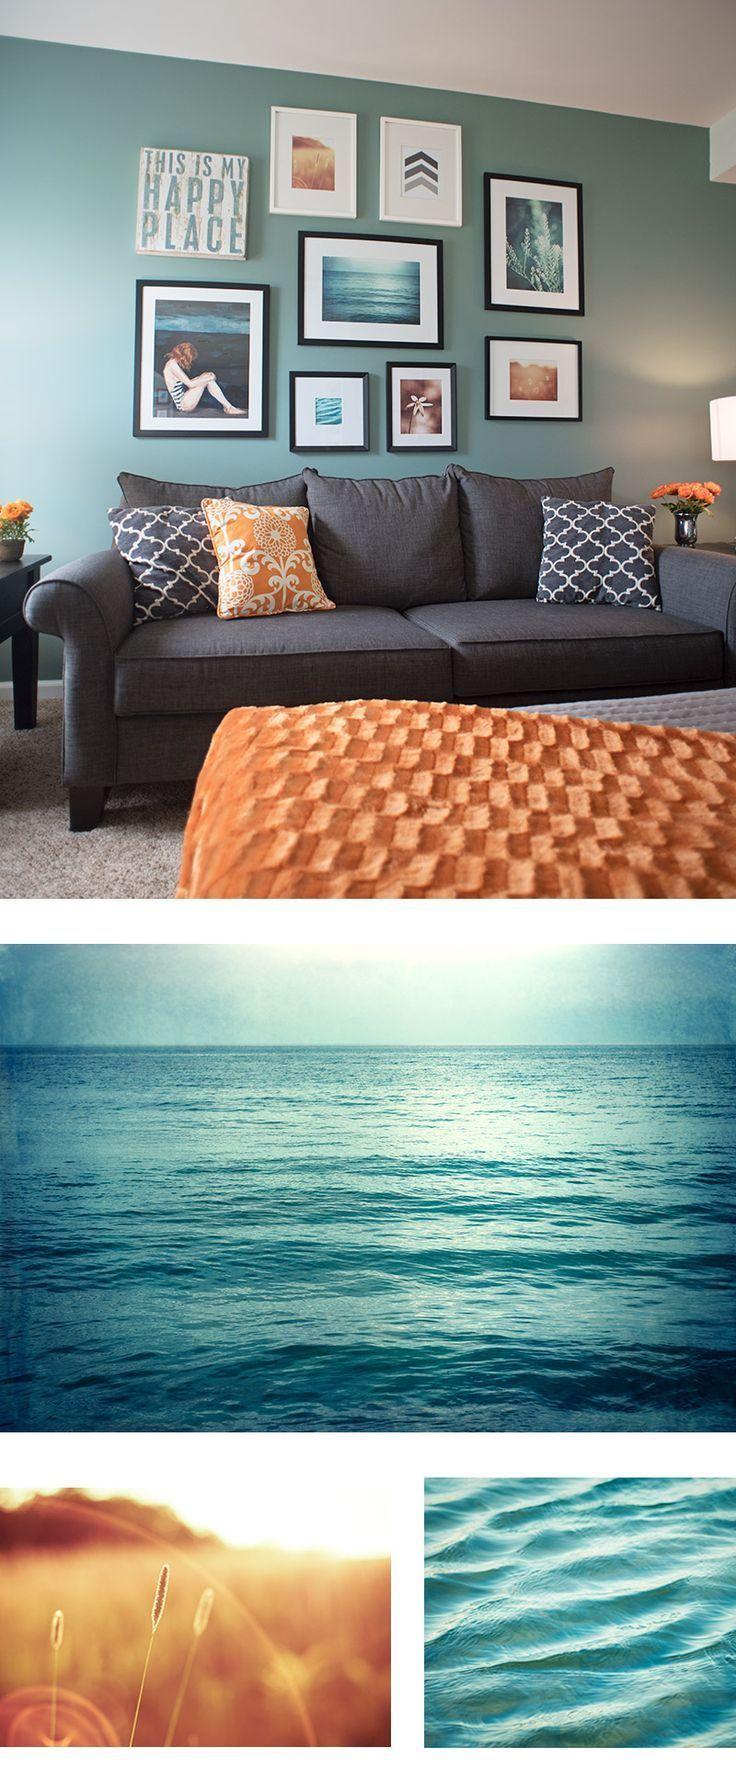 Pleasant 17 Best Ideas About Ocean Home Decor On Pinterest Ocean Bathroom Largest Home Design Picture Inspirations Pitcheantrous